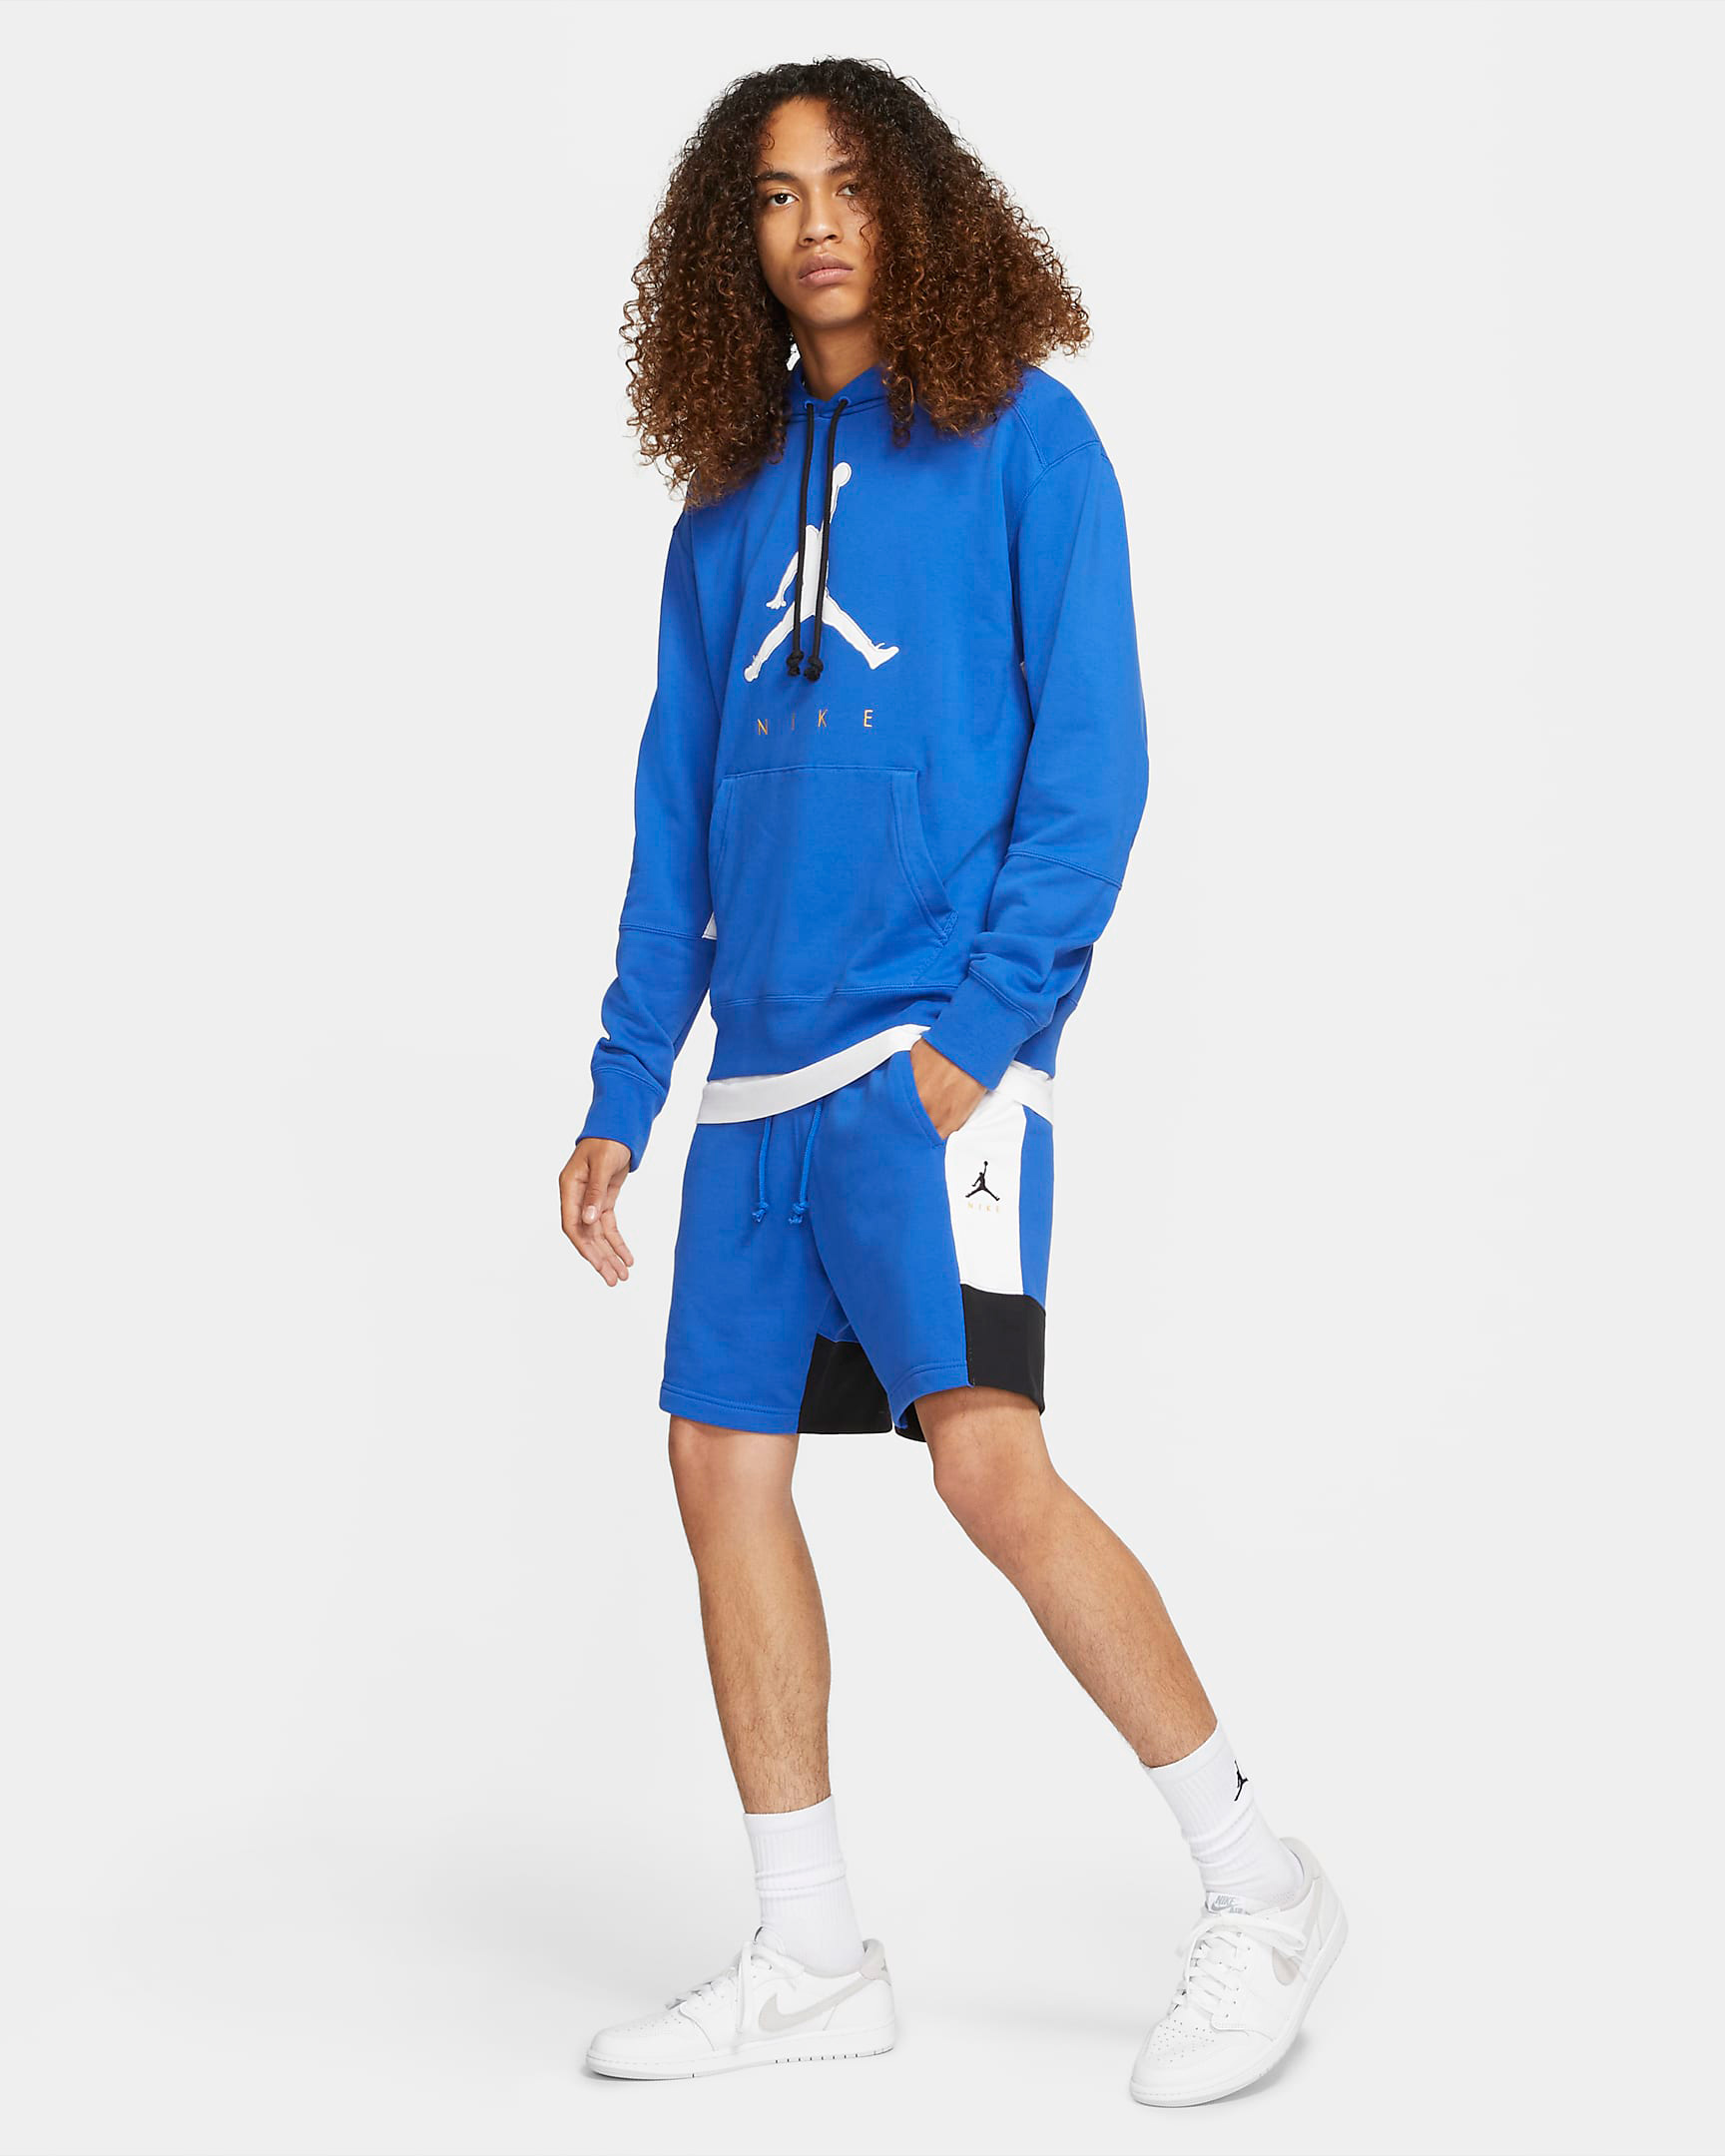 jordan-game-royal-jumpman-hoodie-shorts-outfit